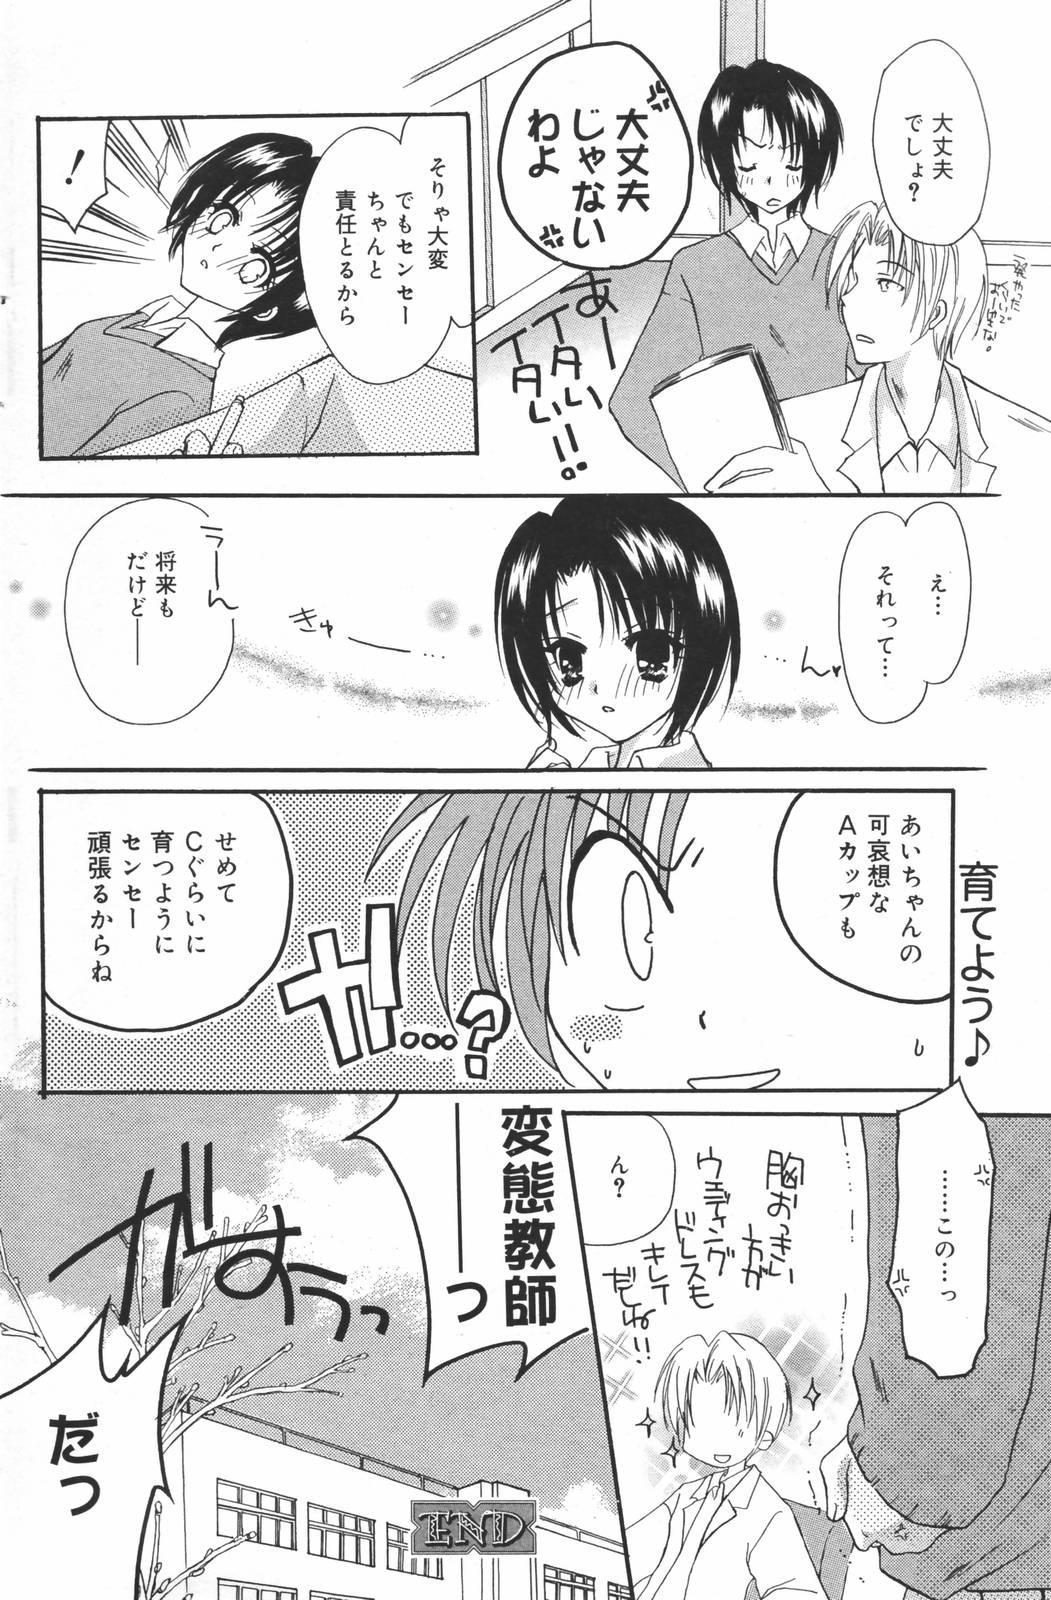 Manga Bangaichi 2007-03 157